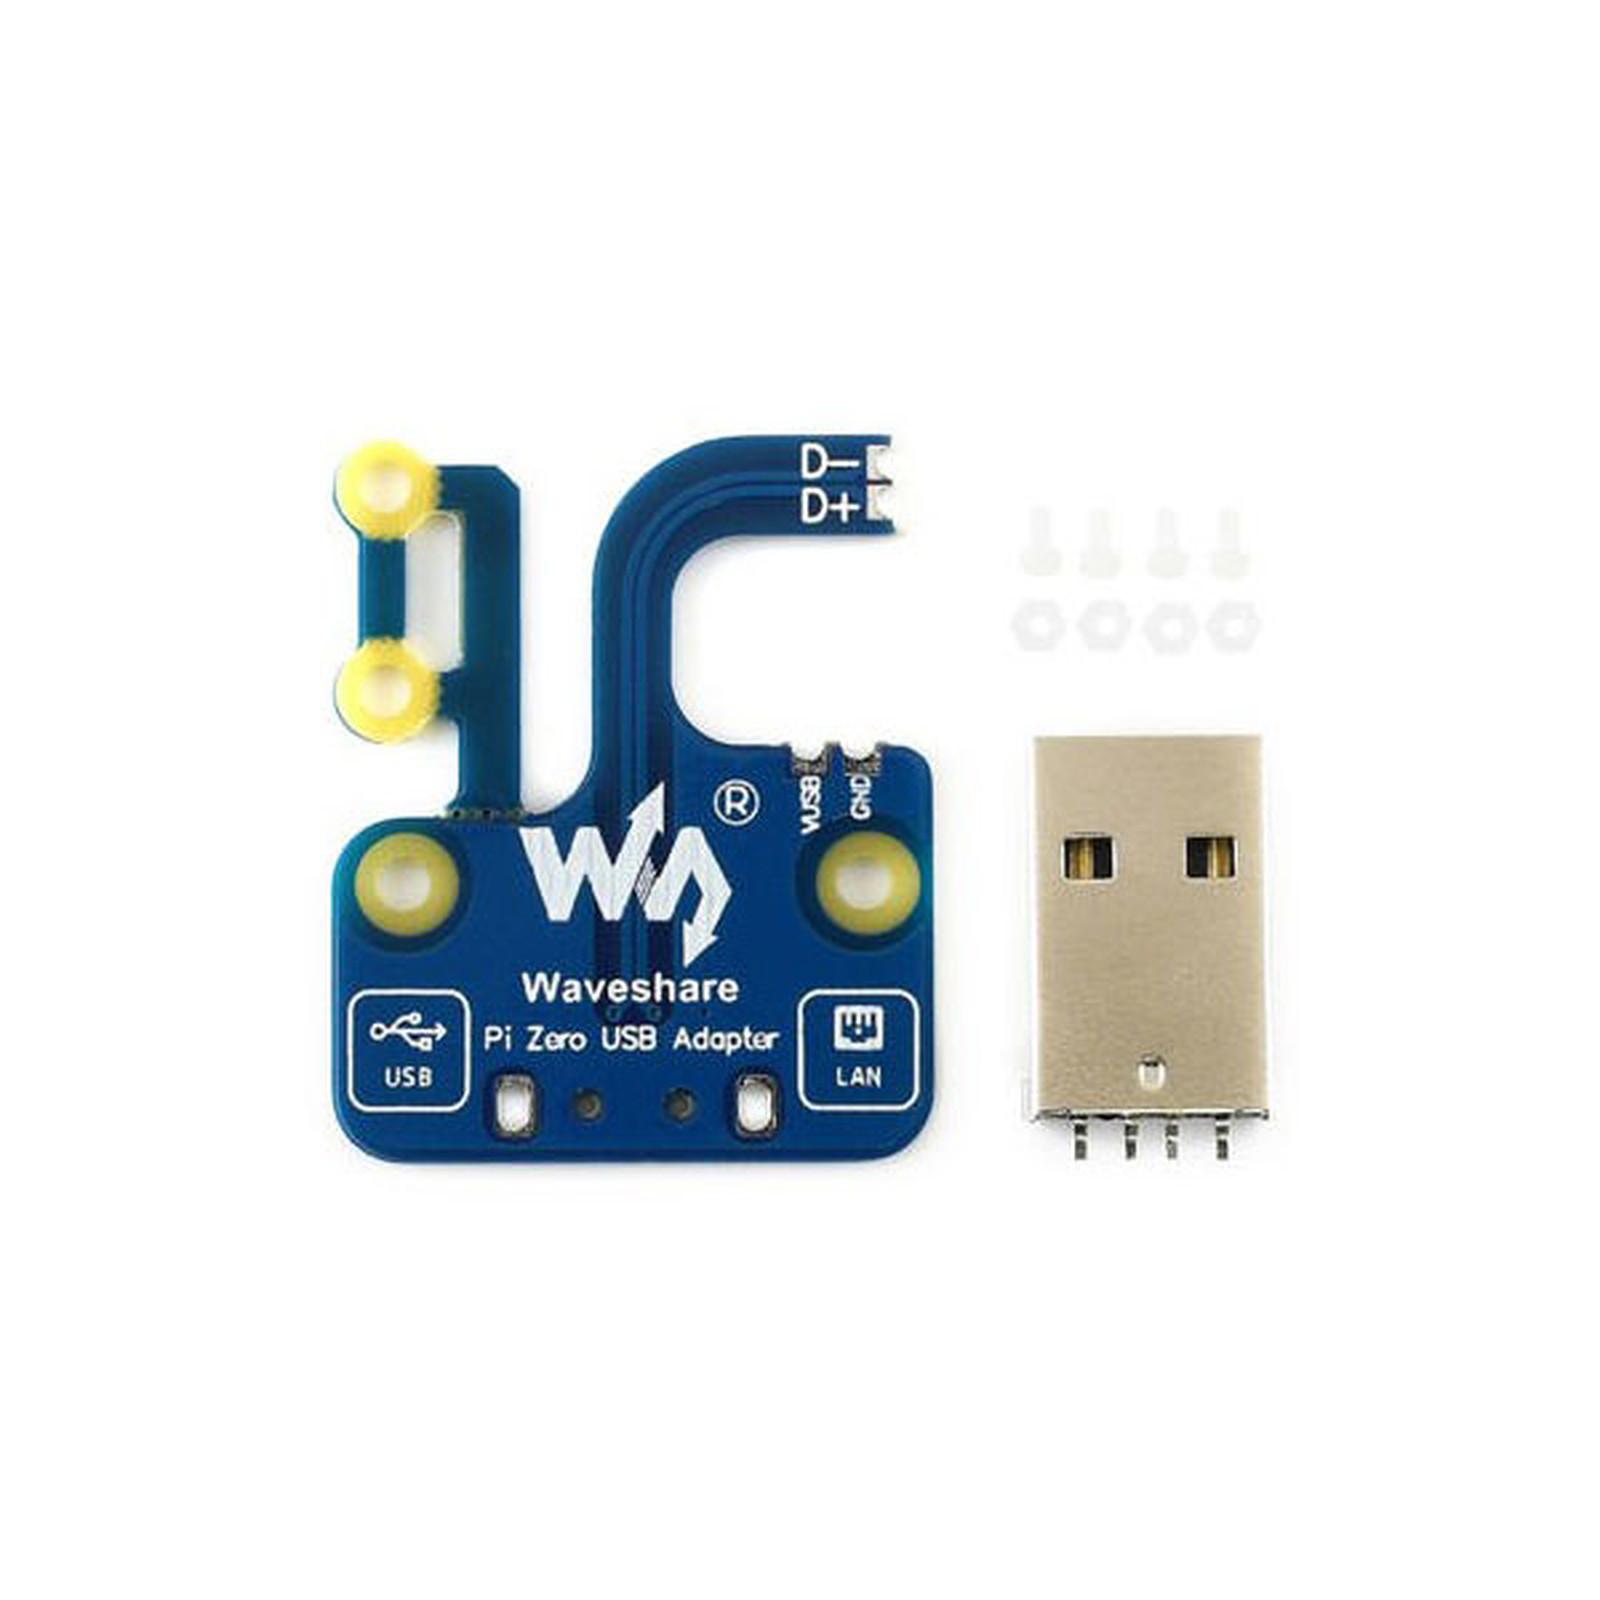 Waveshare Pi Zero USB Adapter